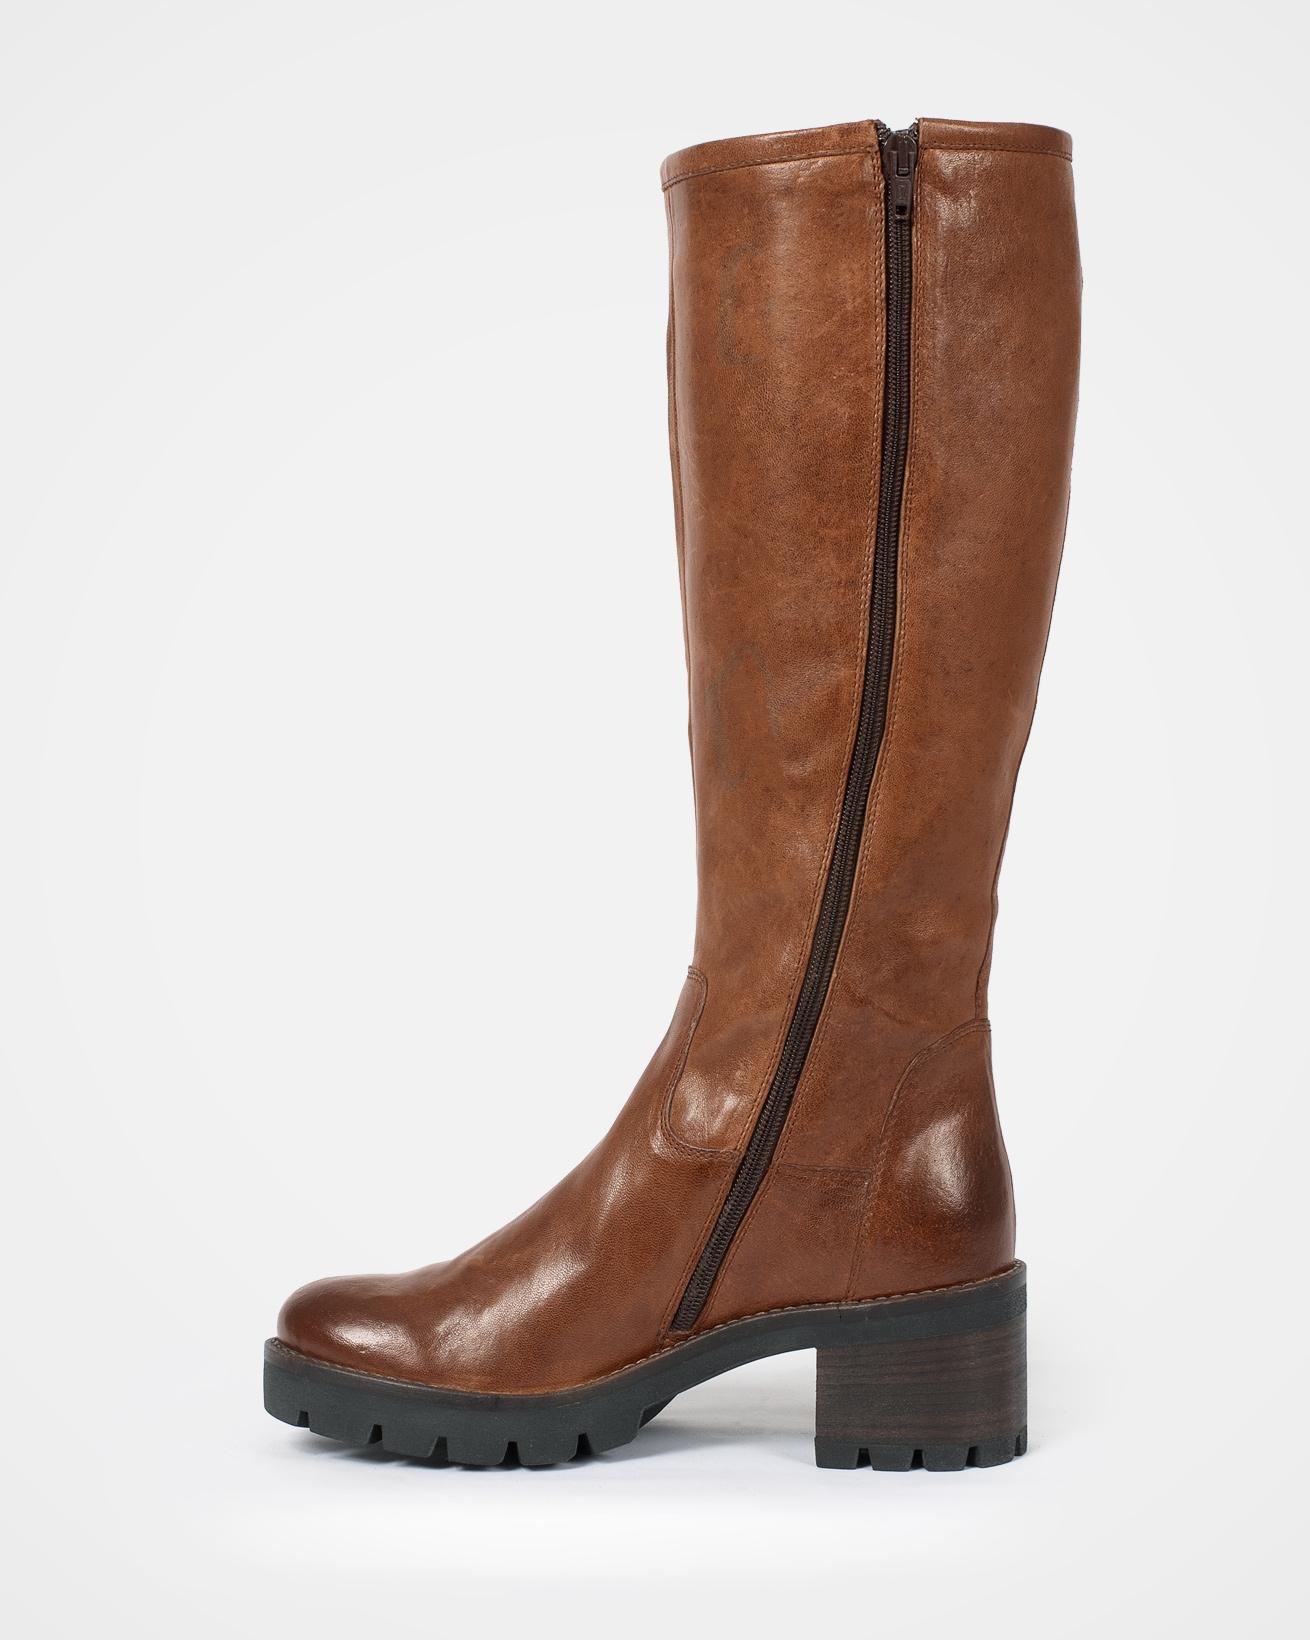 7640-biker-knee-boot-antique-brown-inside-web-lfs-rev.jpg